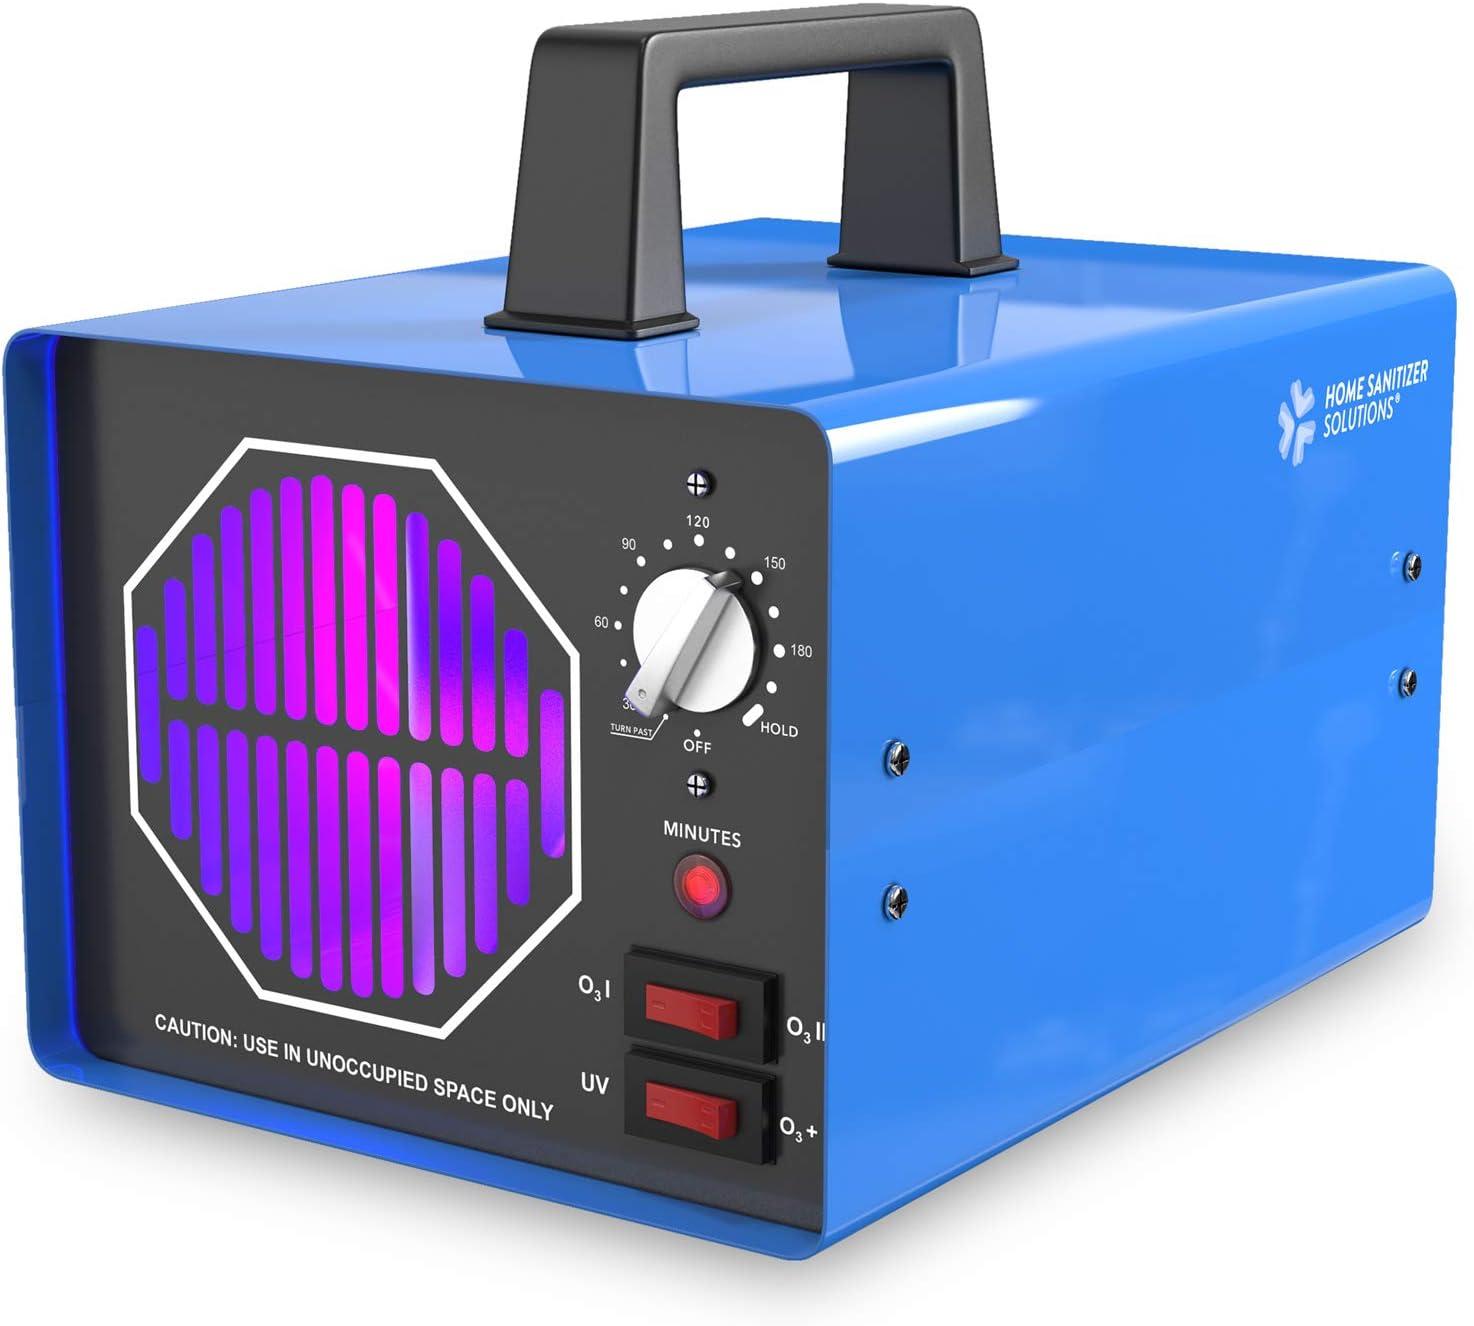 Industrial Ozone Generator 25,000mg/h, O3 High Capacity Air Purifier, Sterilizer and Deodorizer, Q3 Ionizer Machine